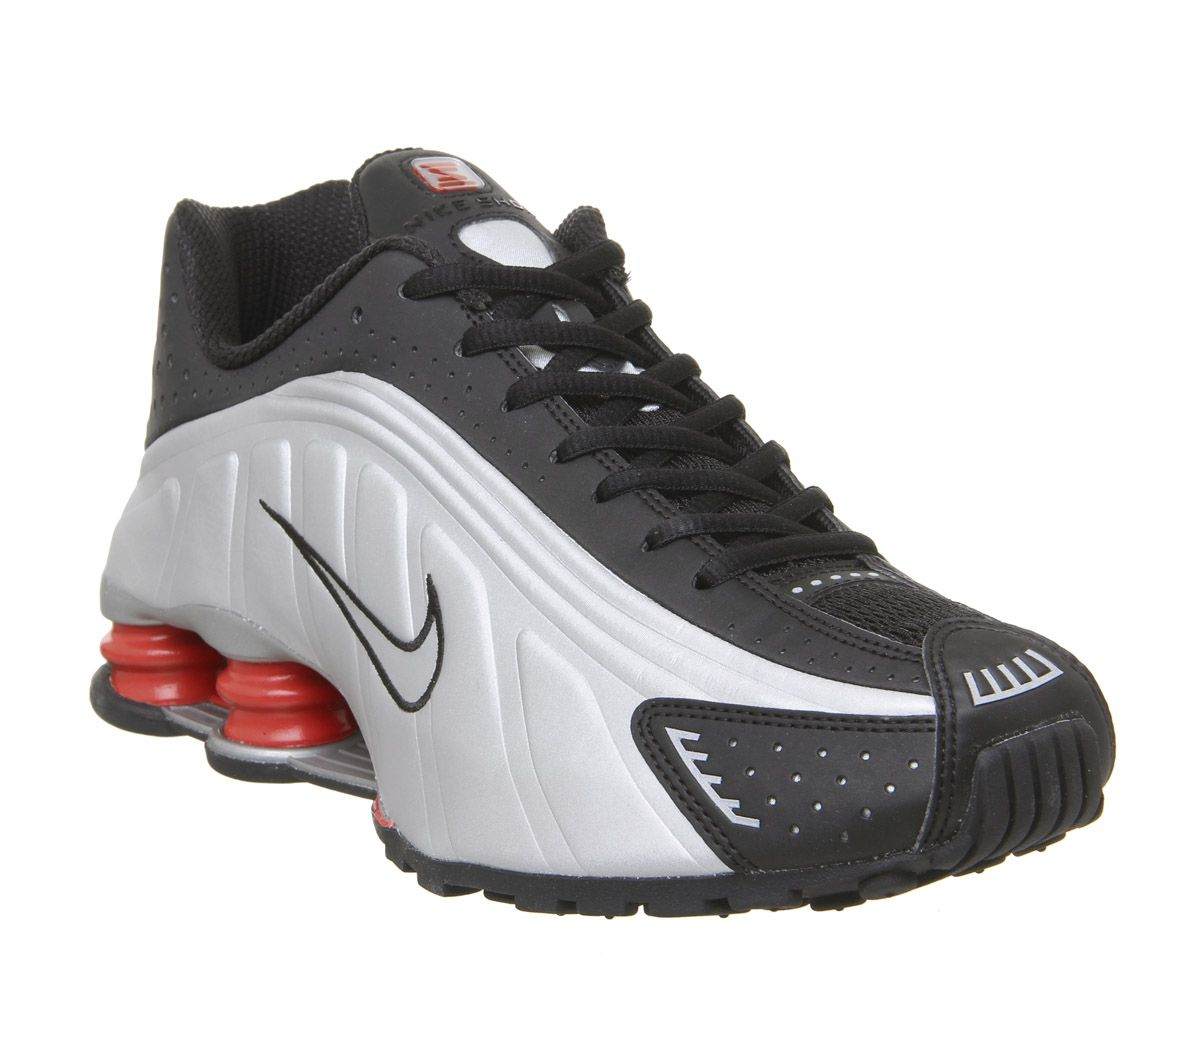 official photos fe0e2 5b2fc Nike Nike Shox R4 Trainers Black Metallic Silver Max Orange ...